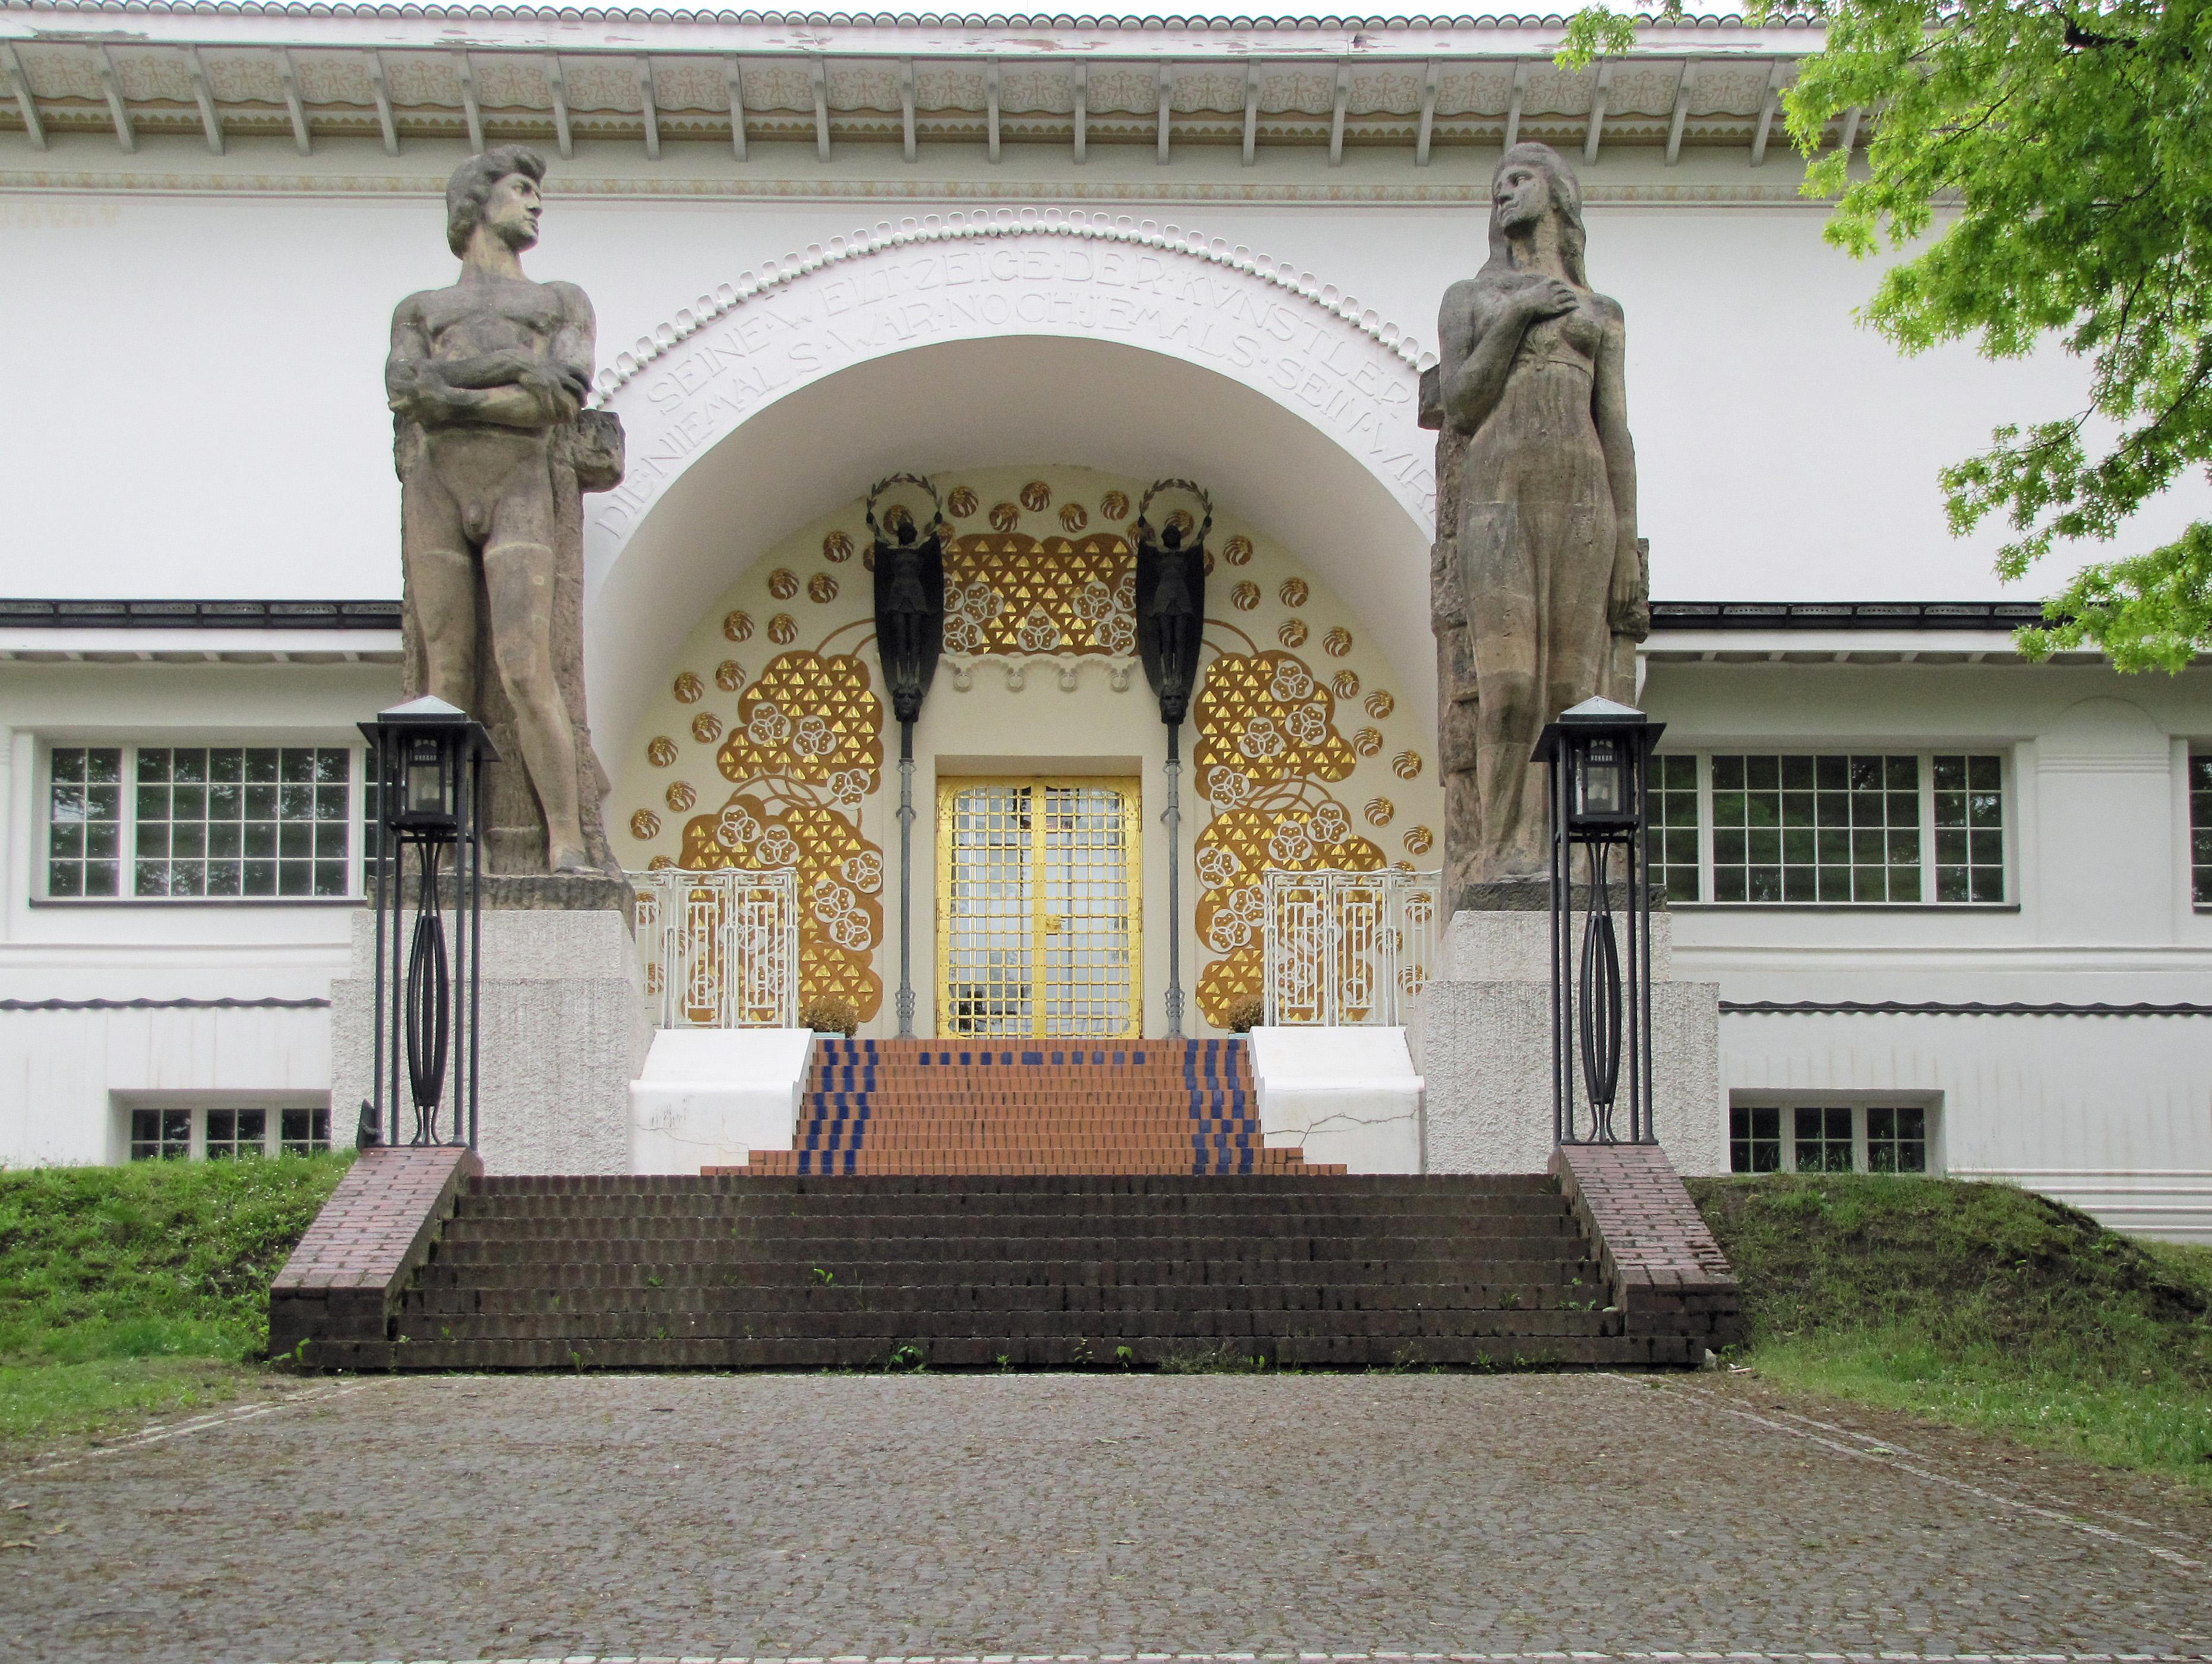 pdf vienna 1900 art life & culture